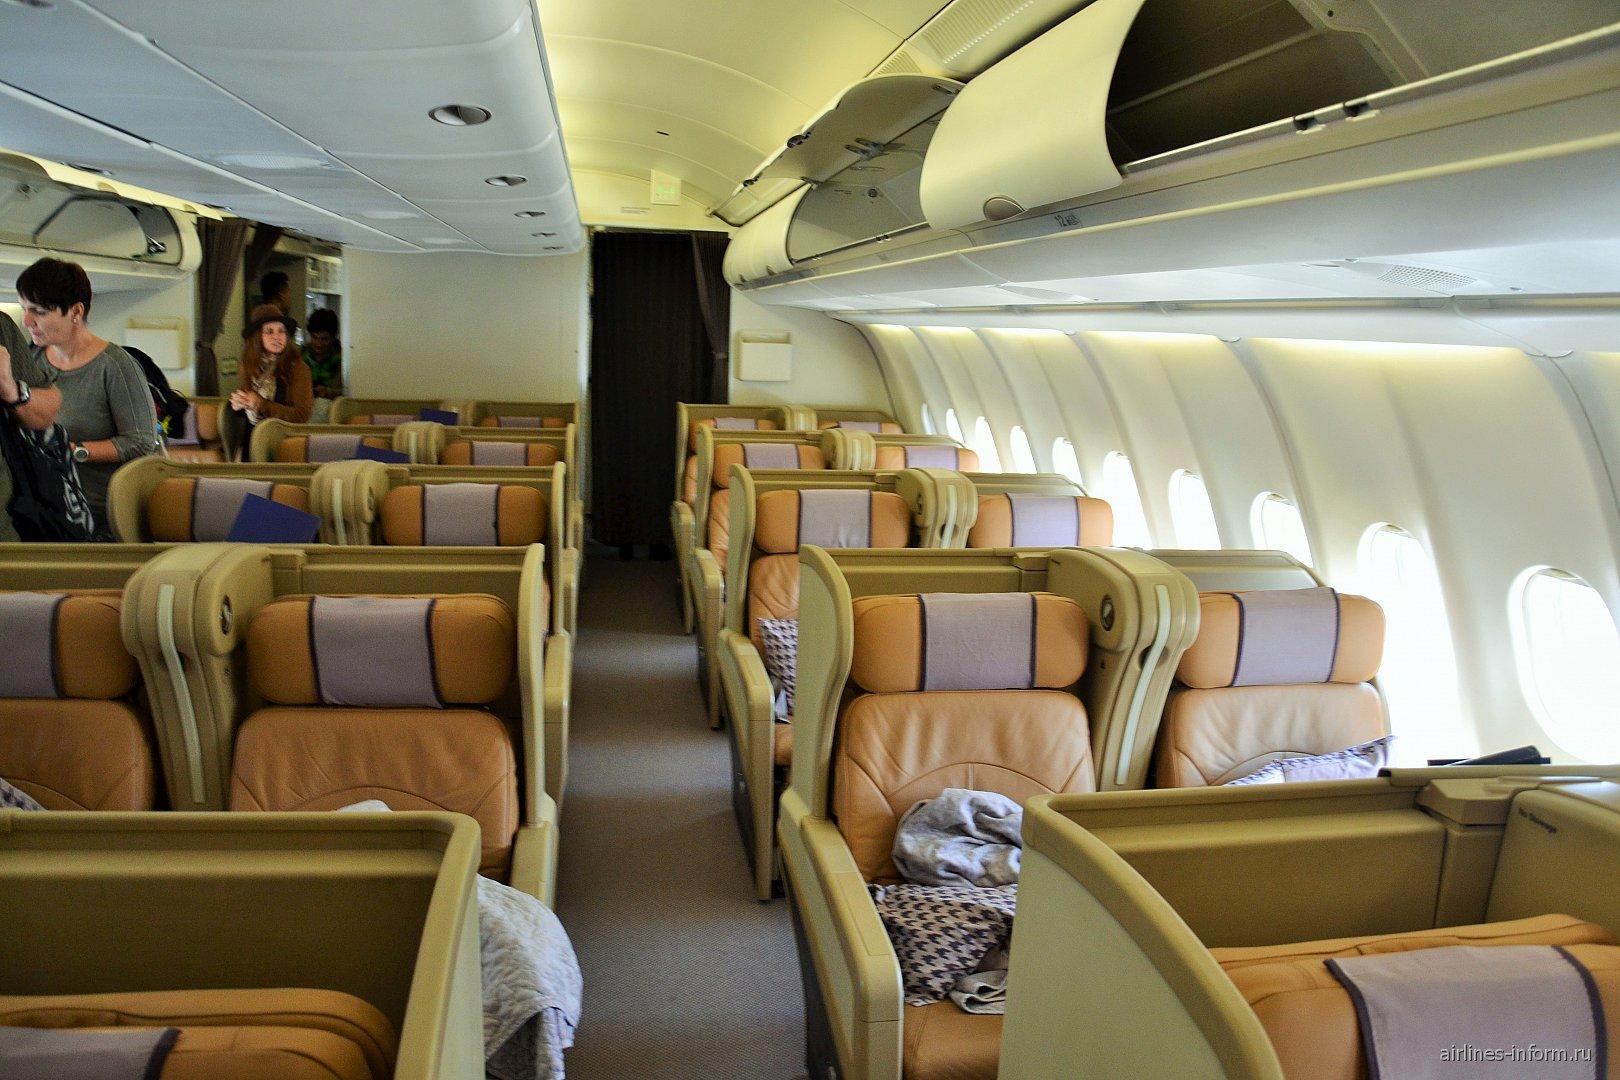 Салон бизнес-класса самолета Airbus A330-300 Сингапурских авиалиний